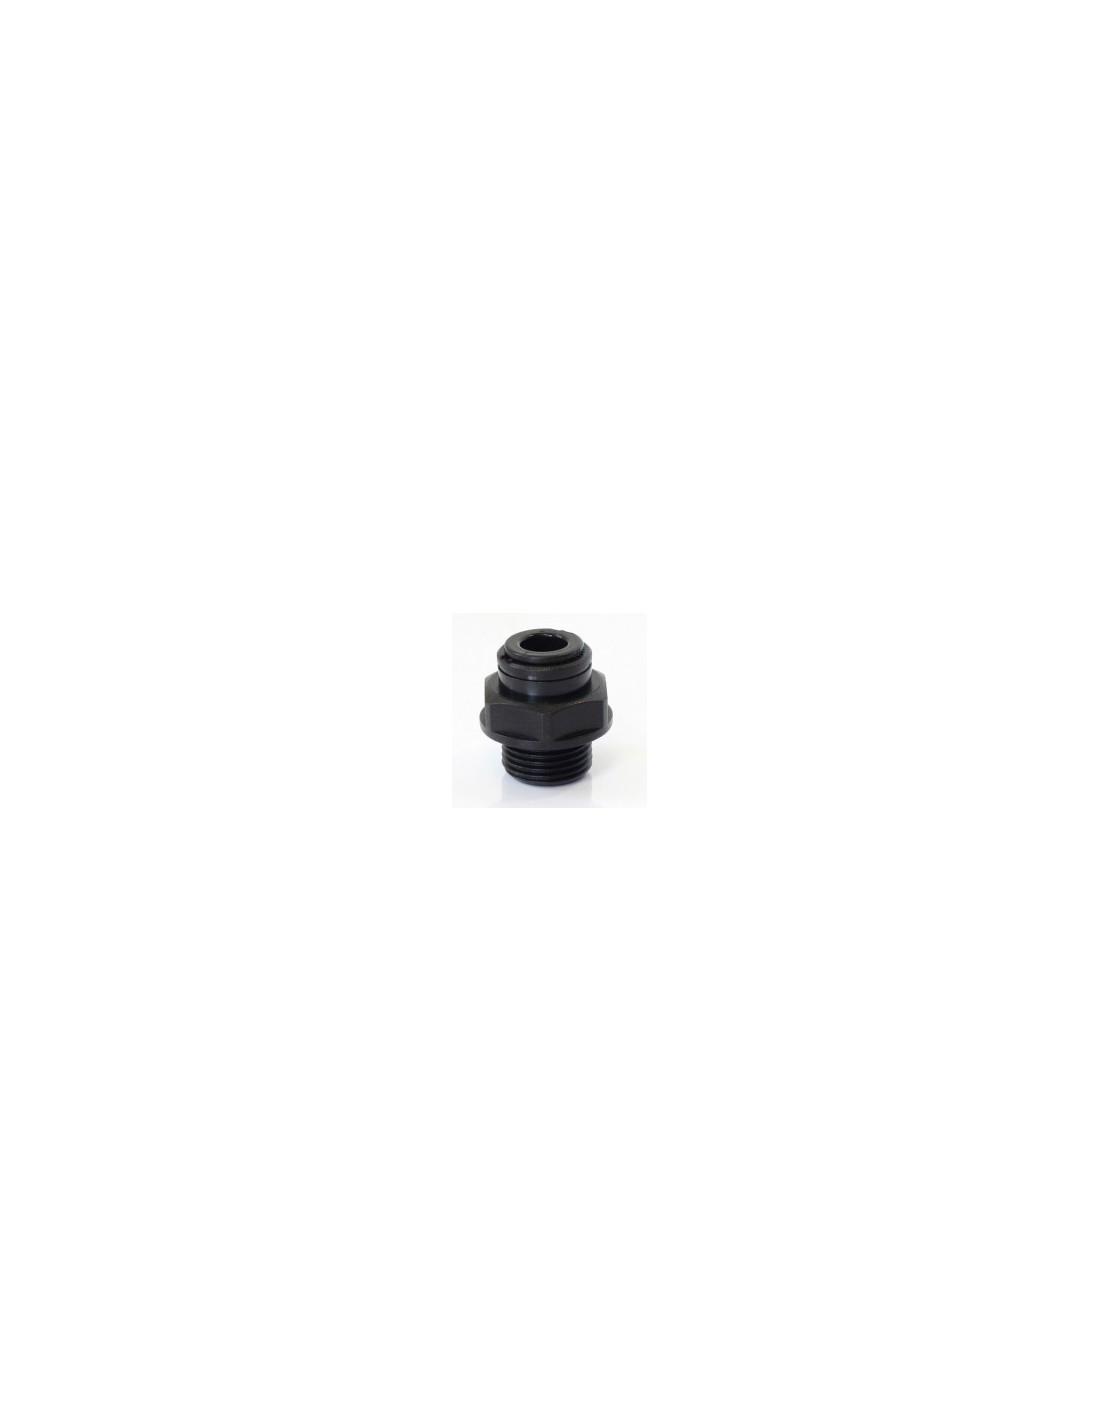 SPO01585 - JG 3/8 x 8 mm (5/16)